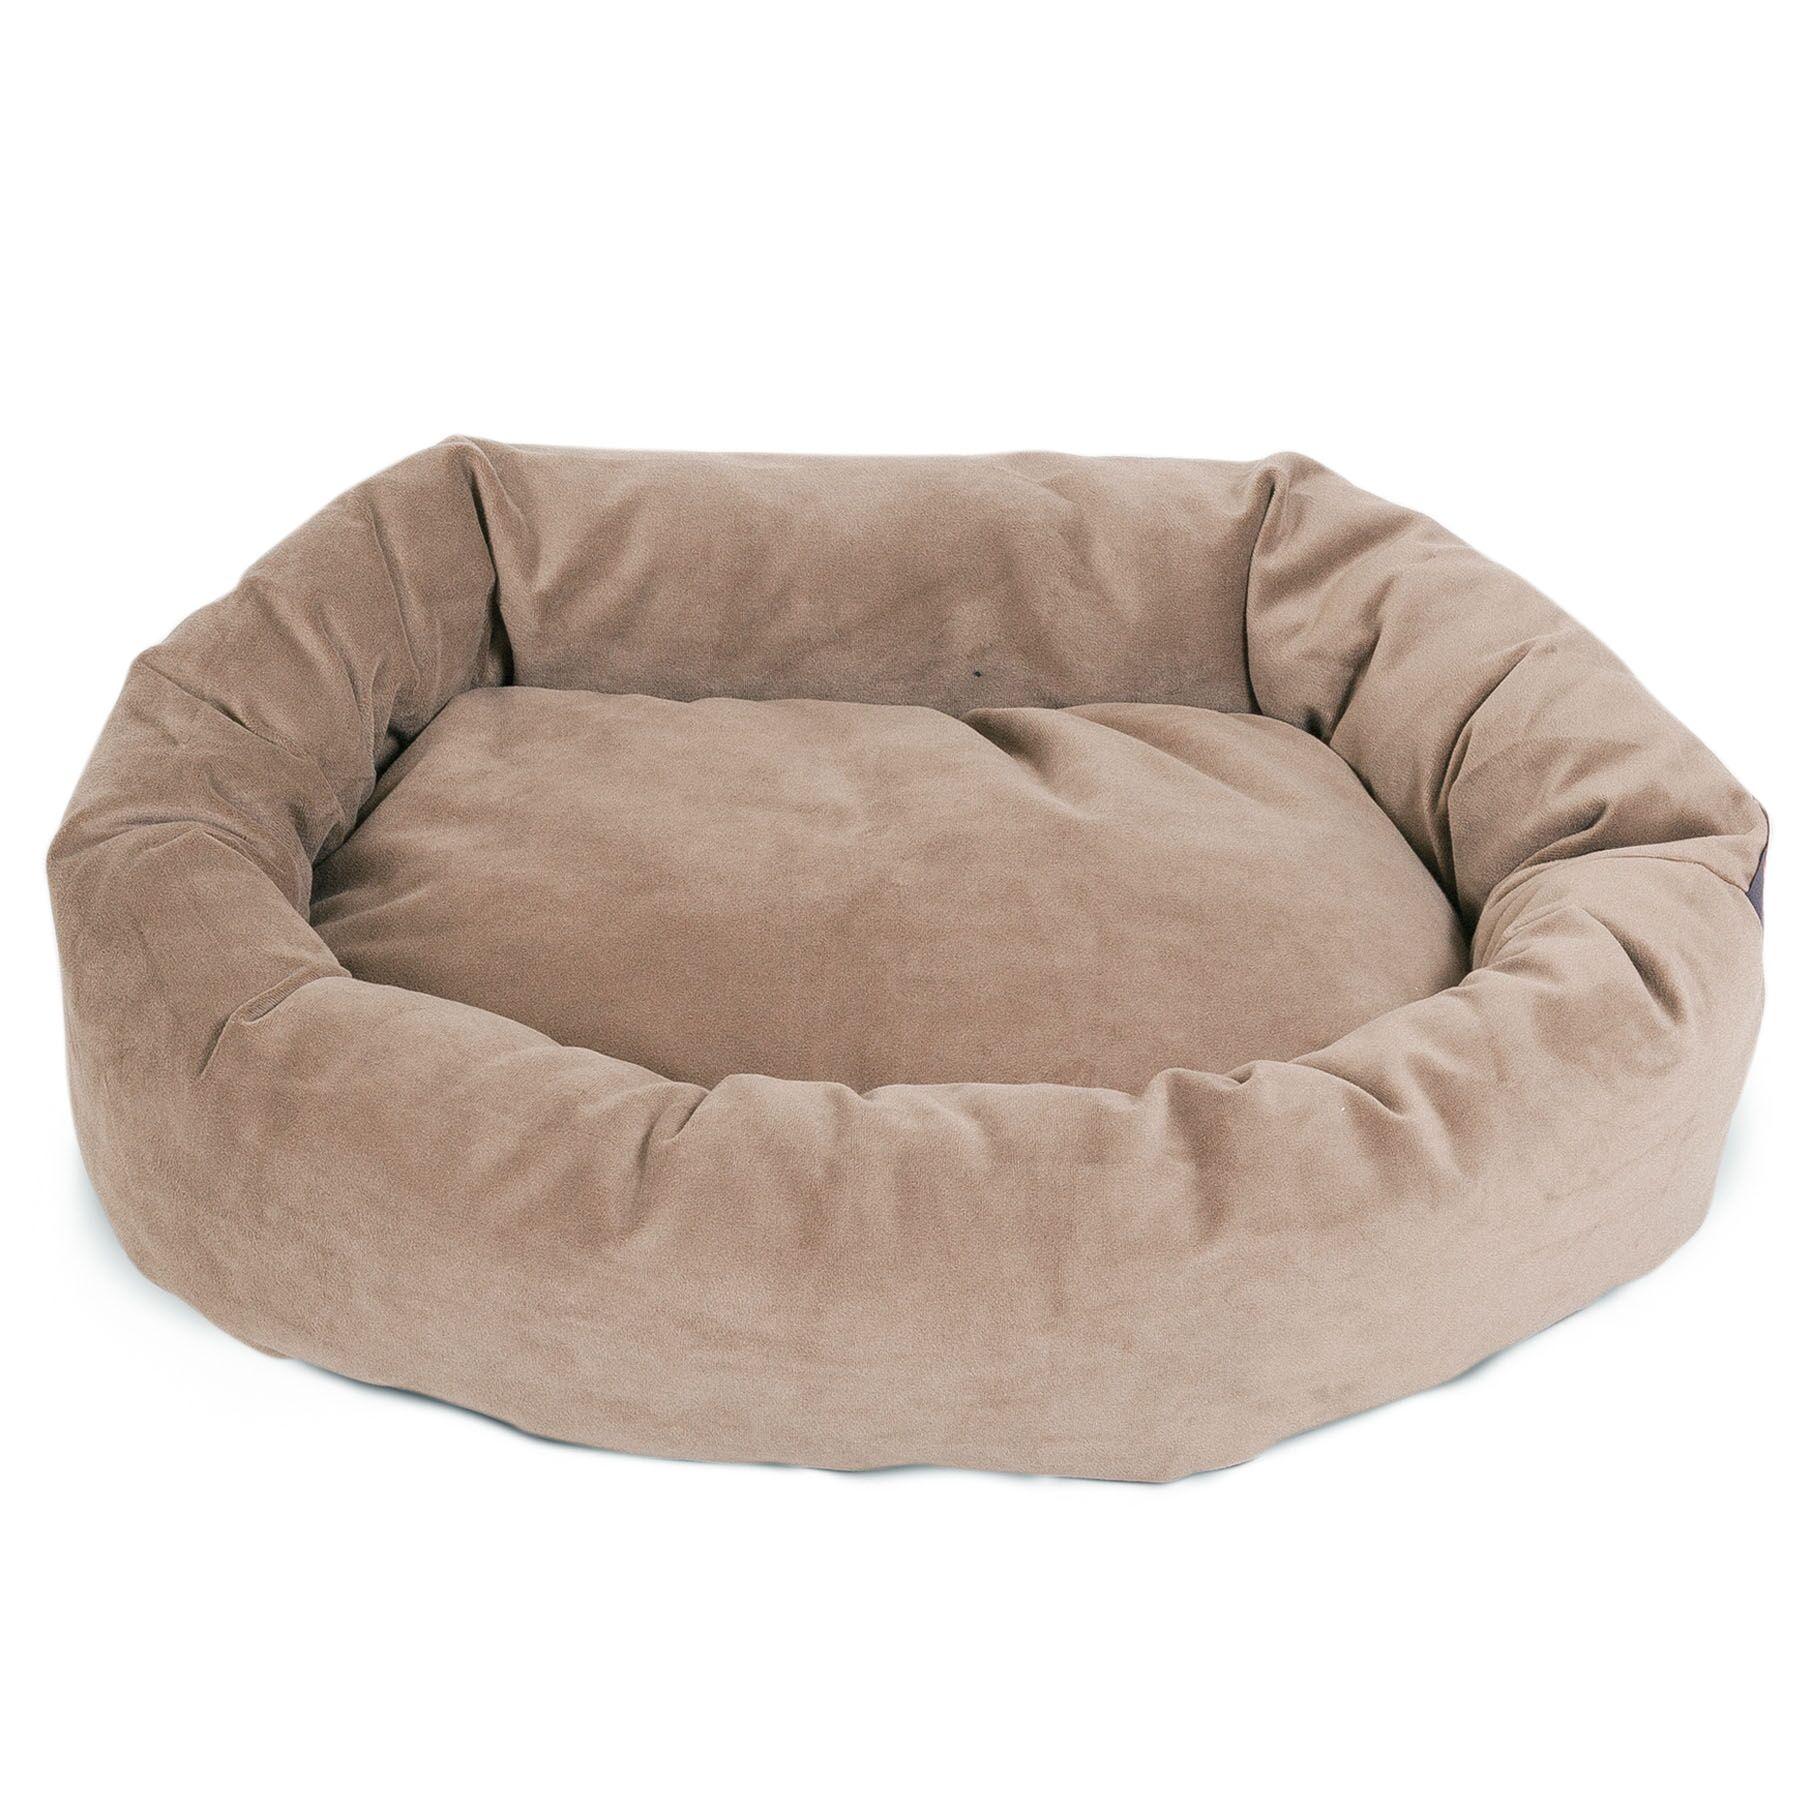 Bagel Donut Dog Bed Color: Stone, Size: X-Large (7